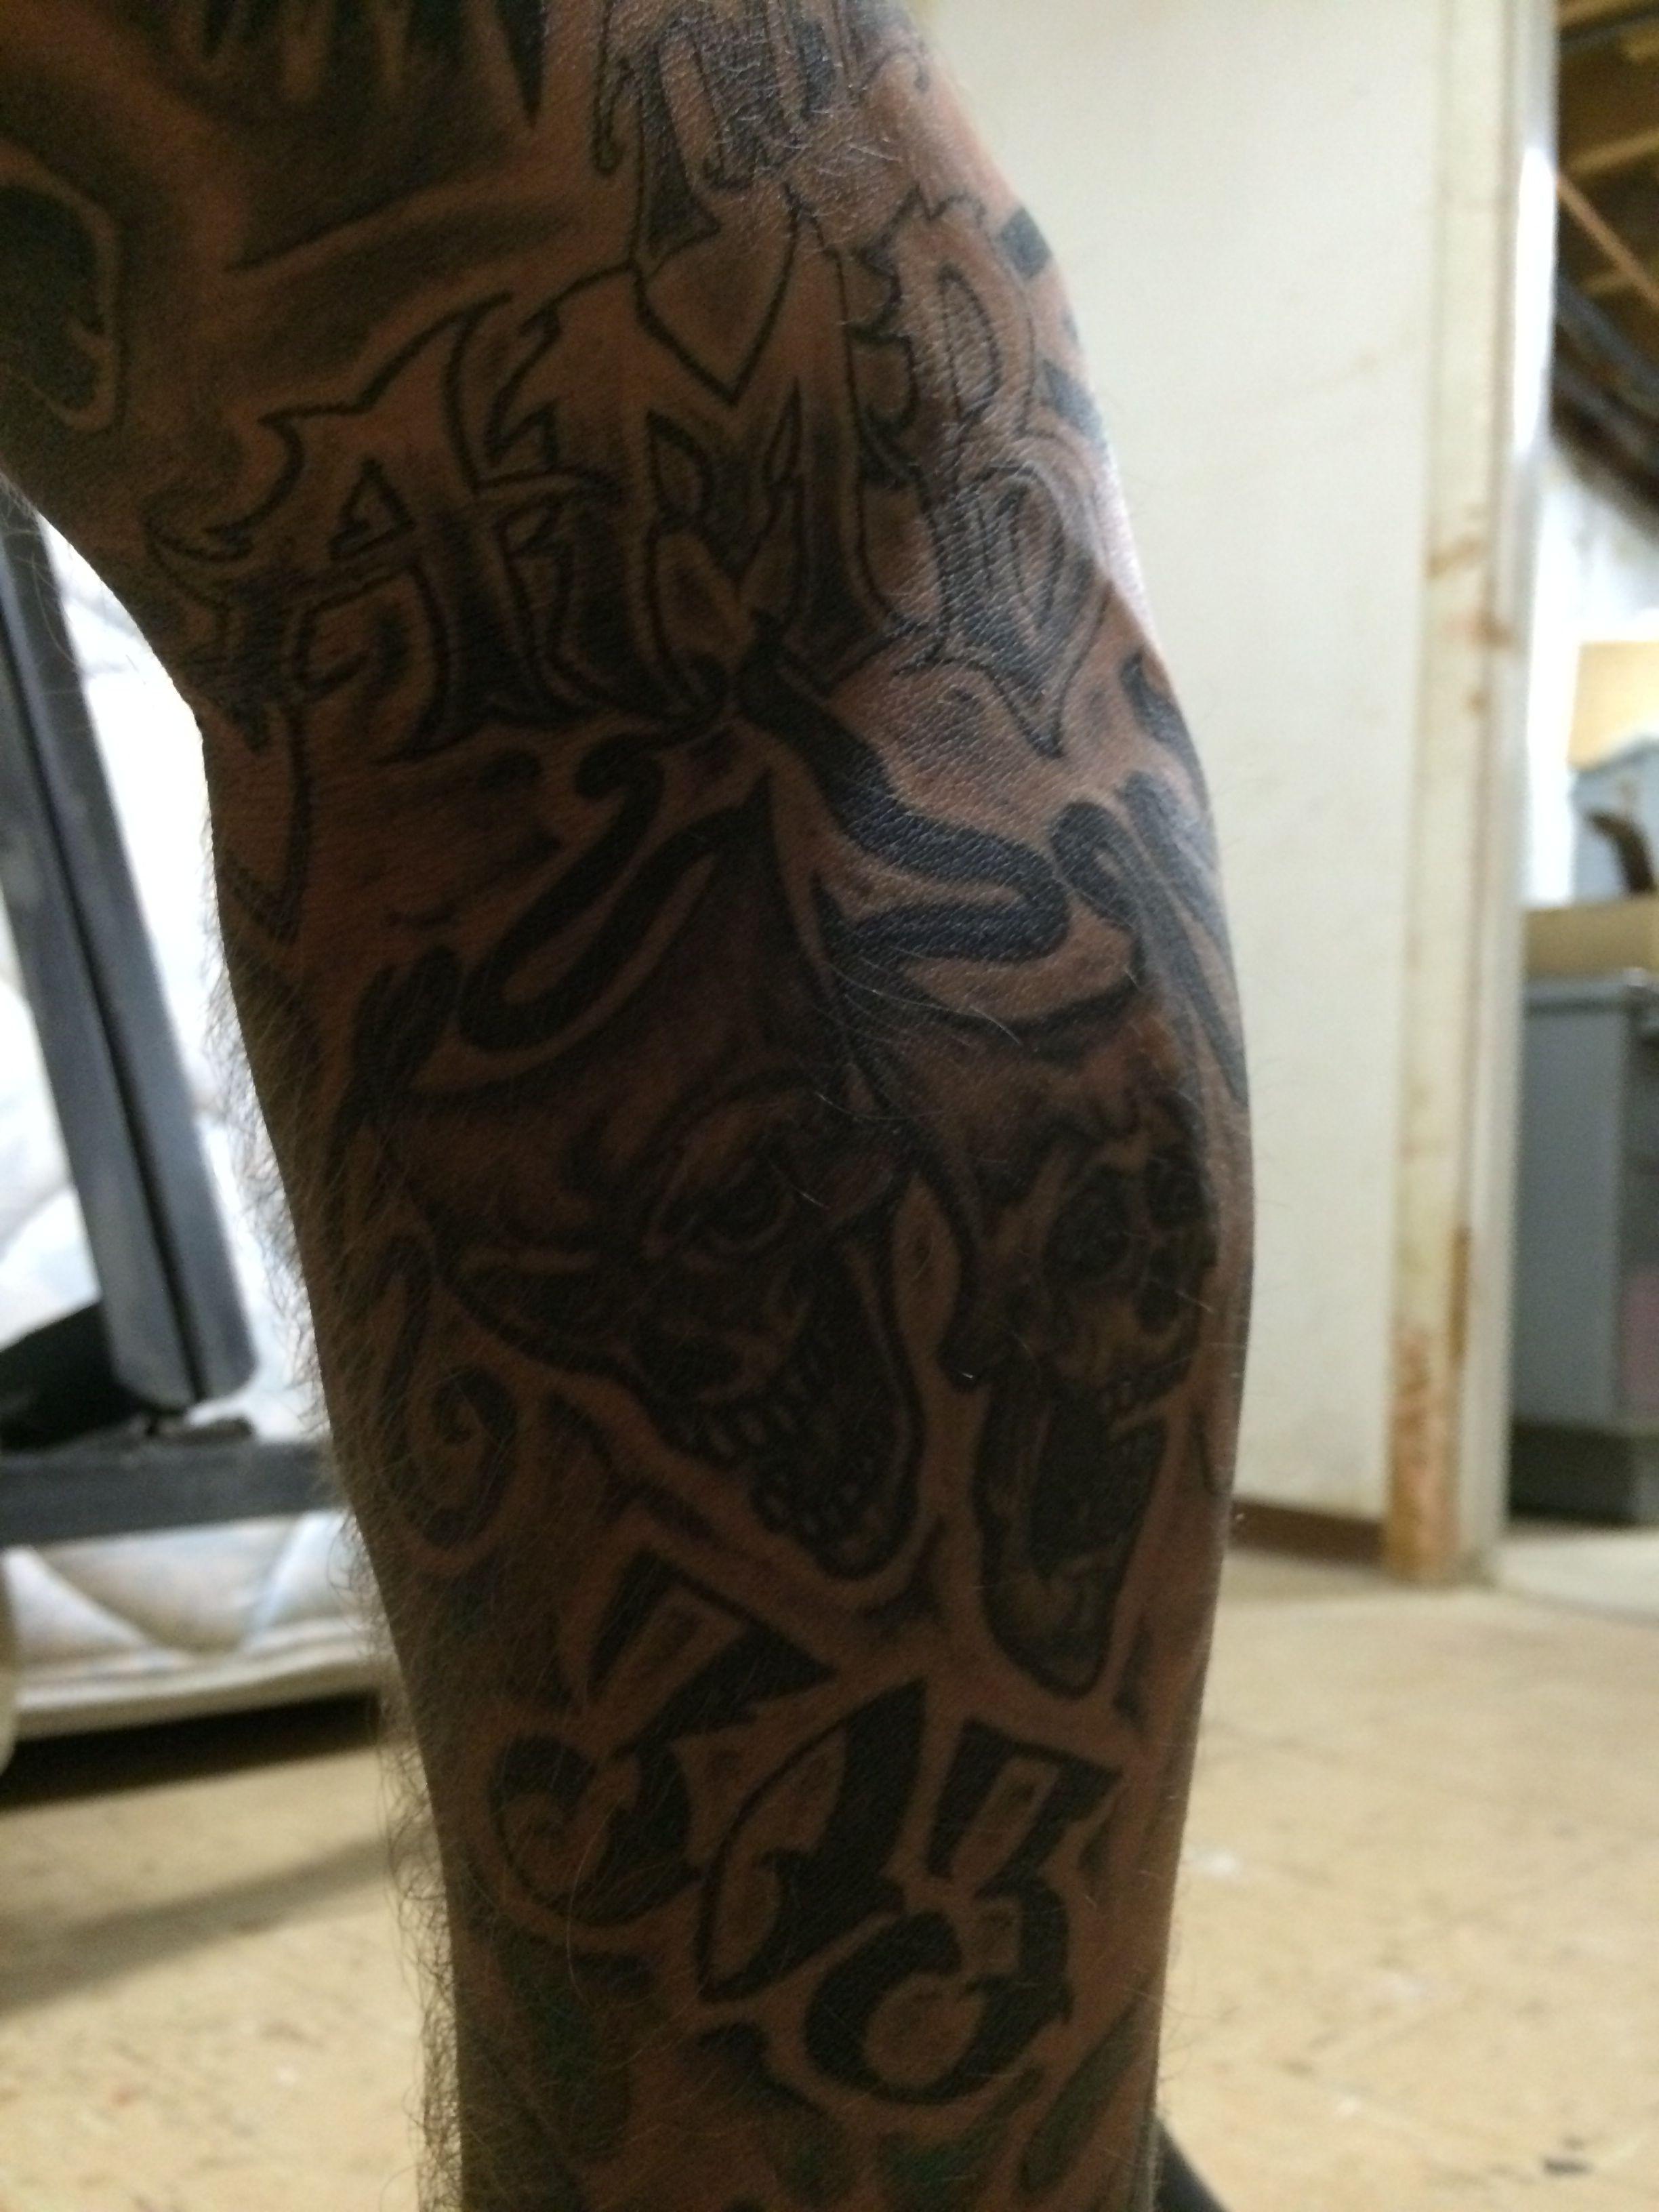 Colorado love 303 polynesian tattoo tattoos polynesian